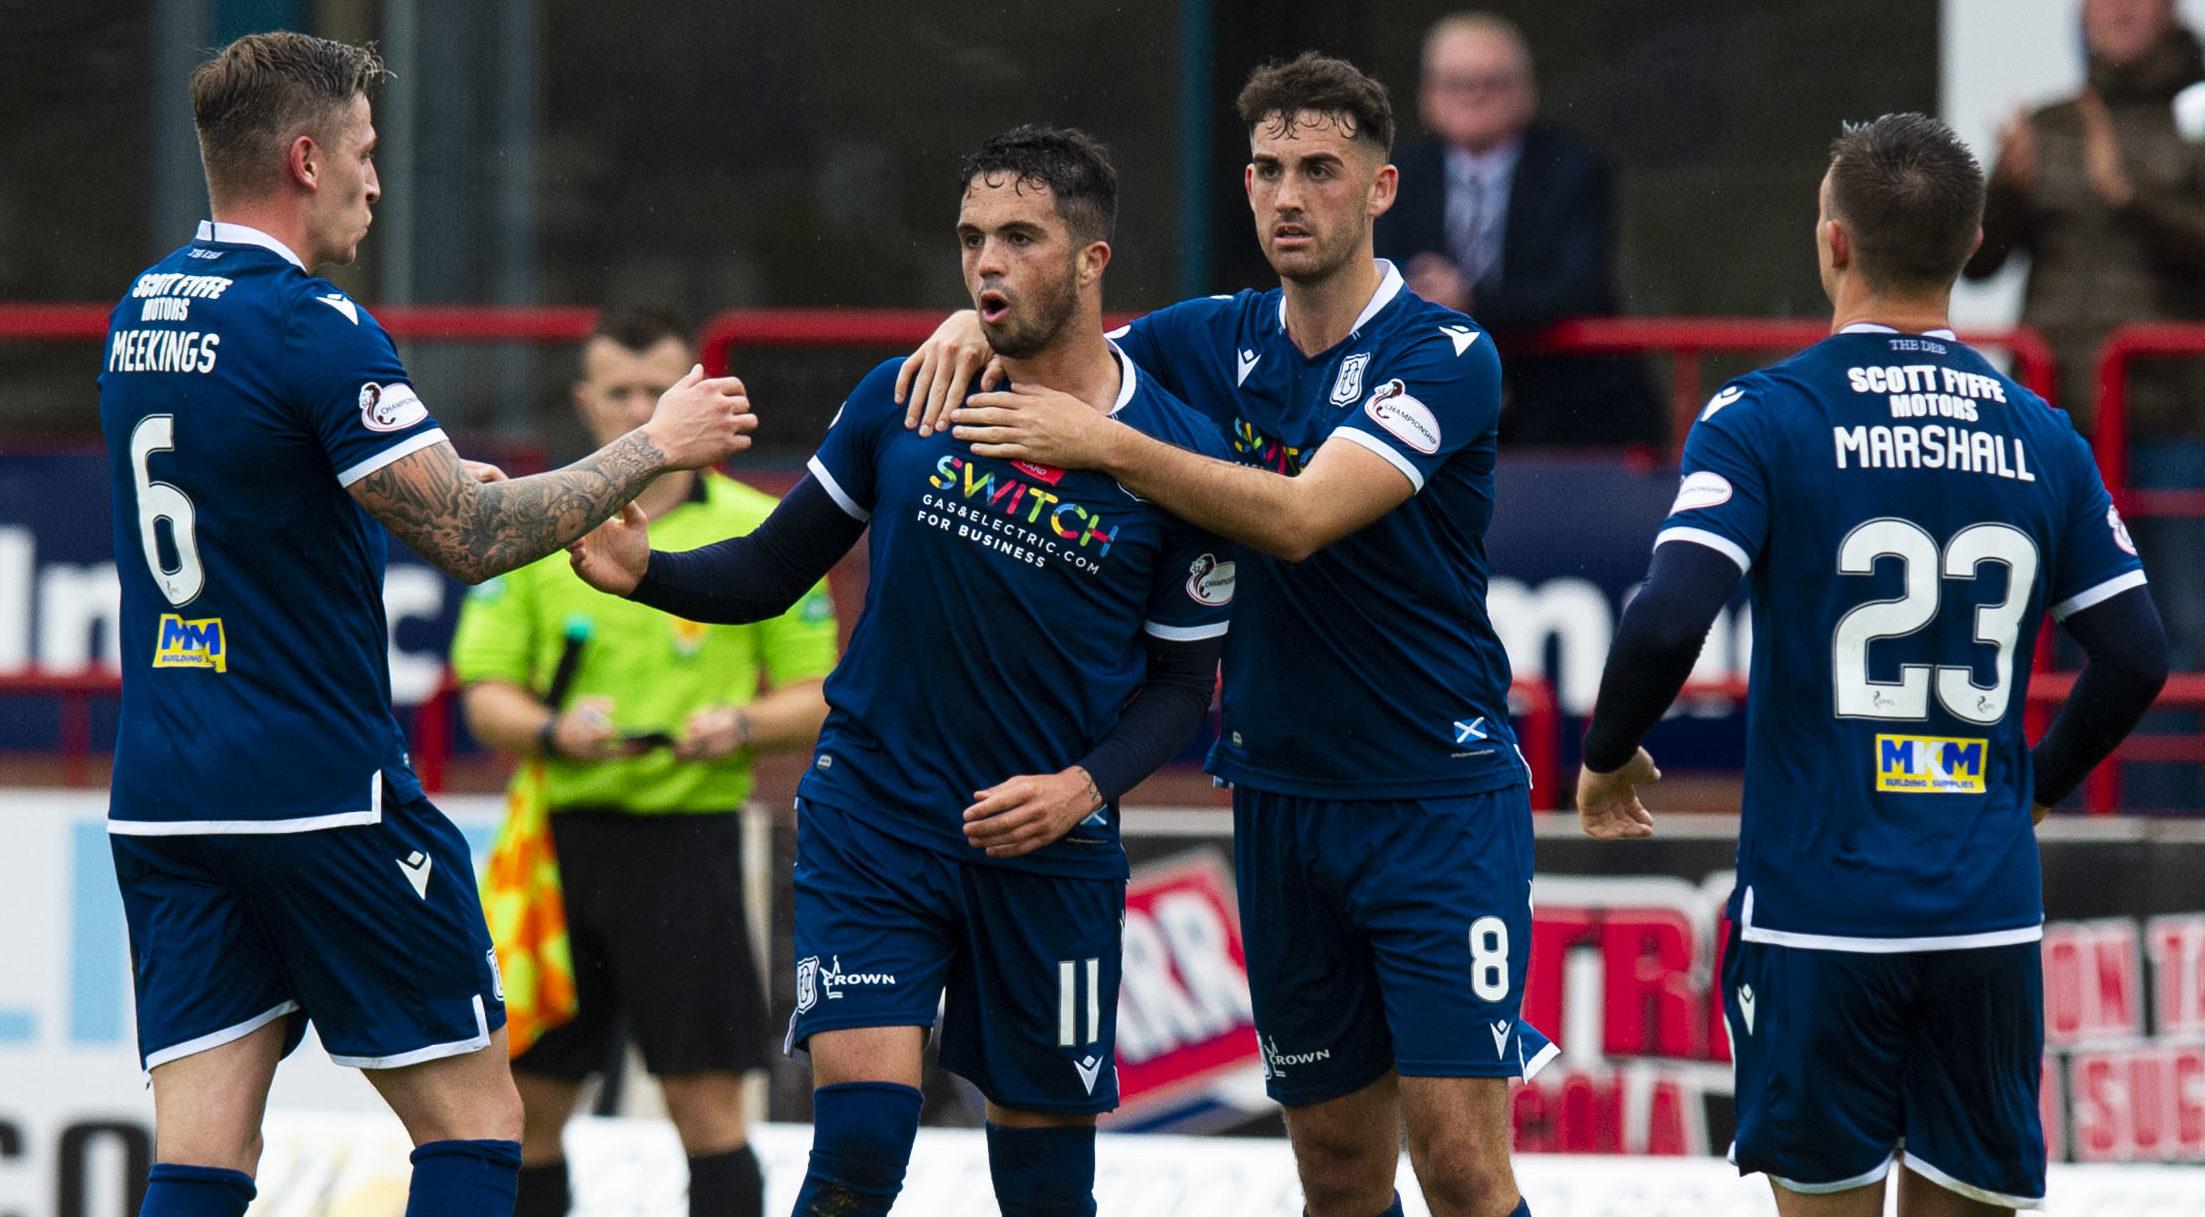 Dundee's Declan McDaid celebrates his goal.